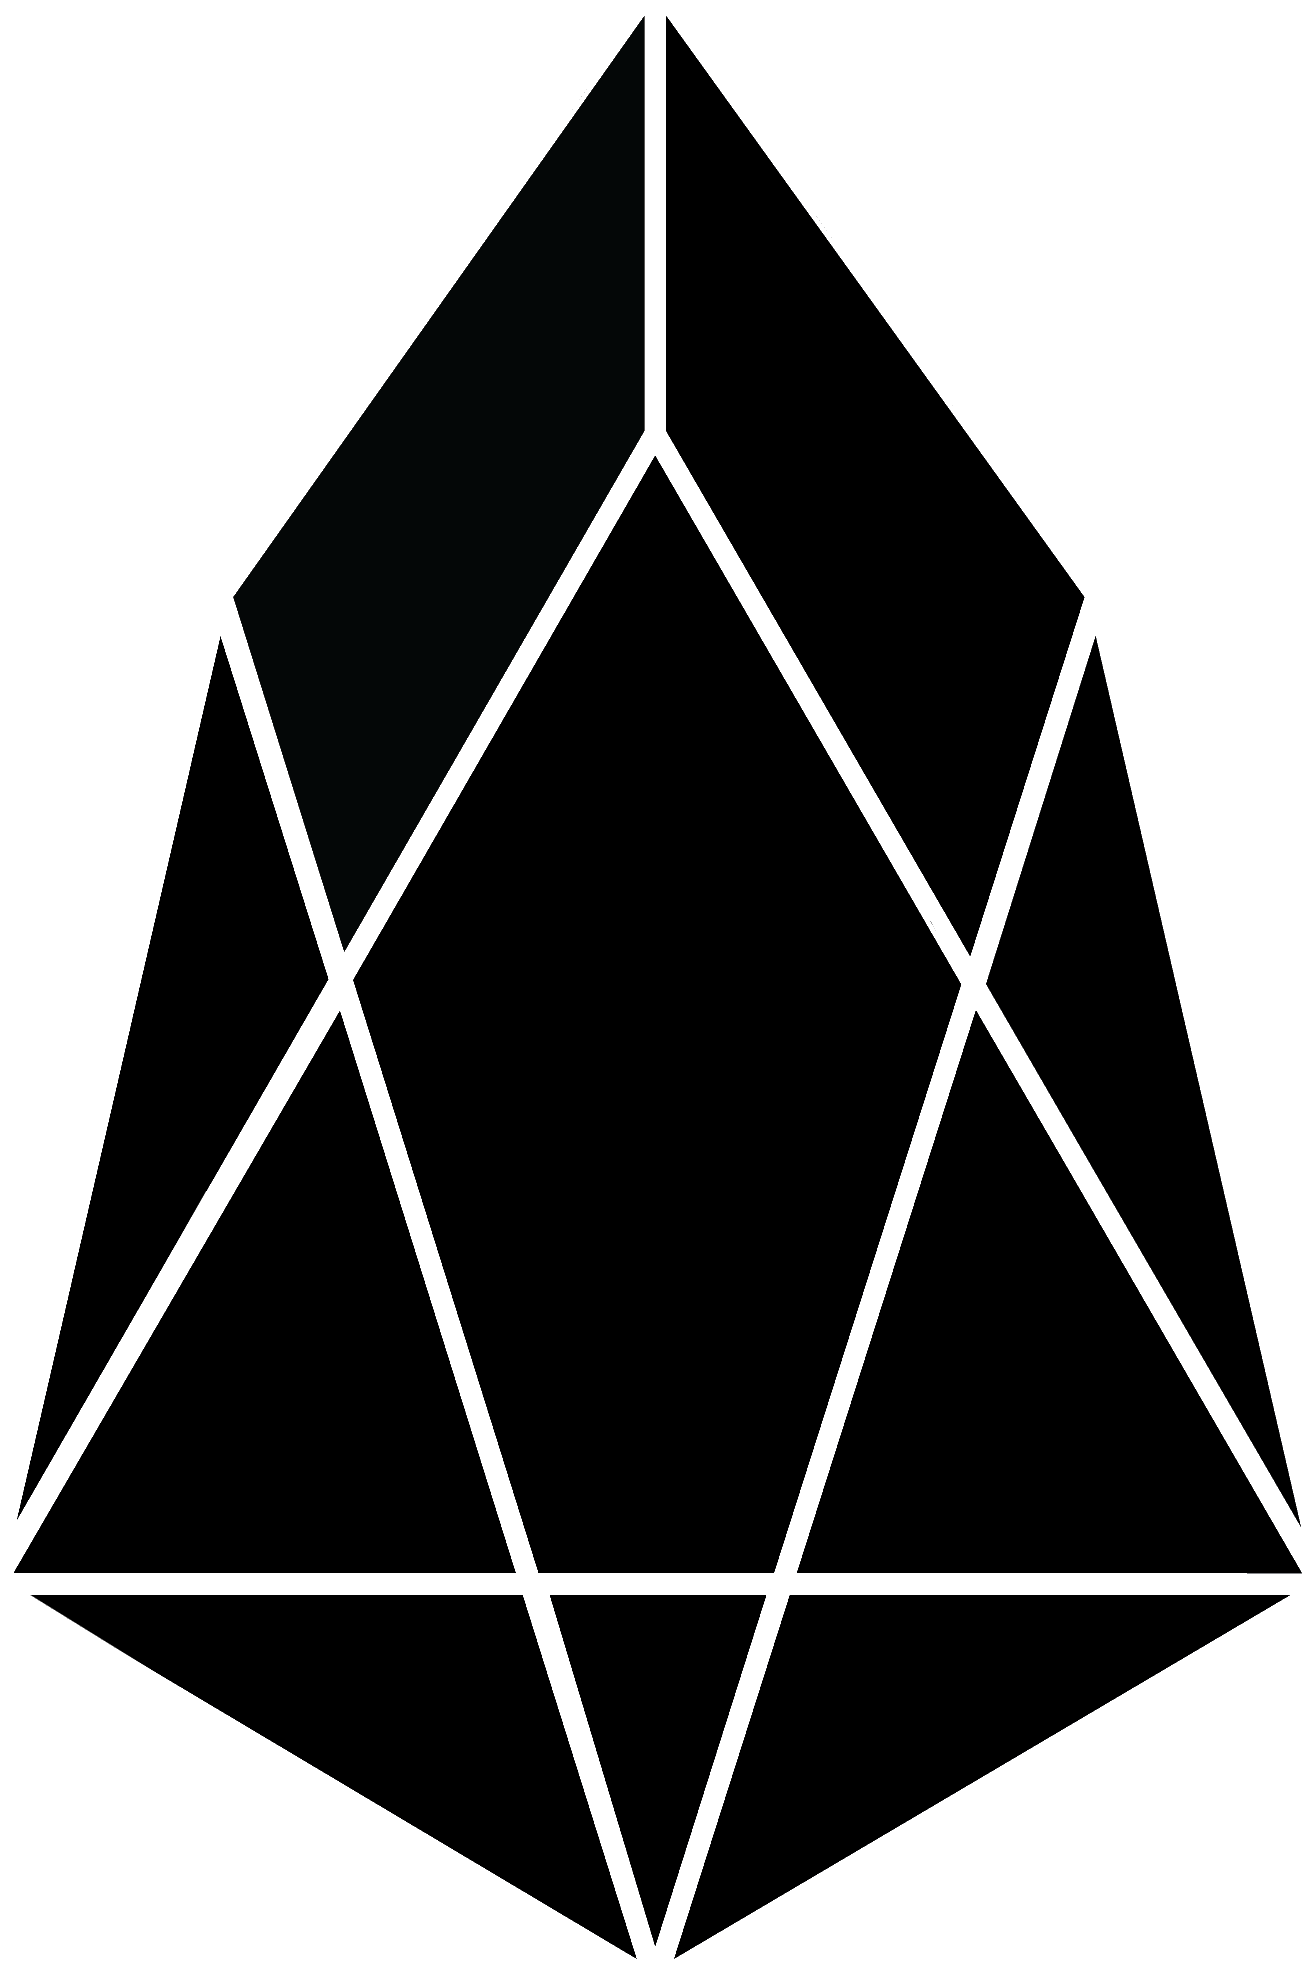 Eos logo clipart clipart transparent stock EOS Logo Vector Icon Template Clipart Free Download clipart transparent stock